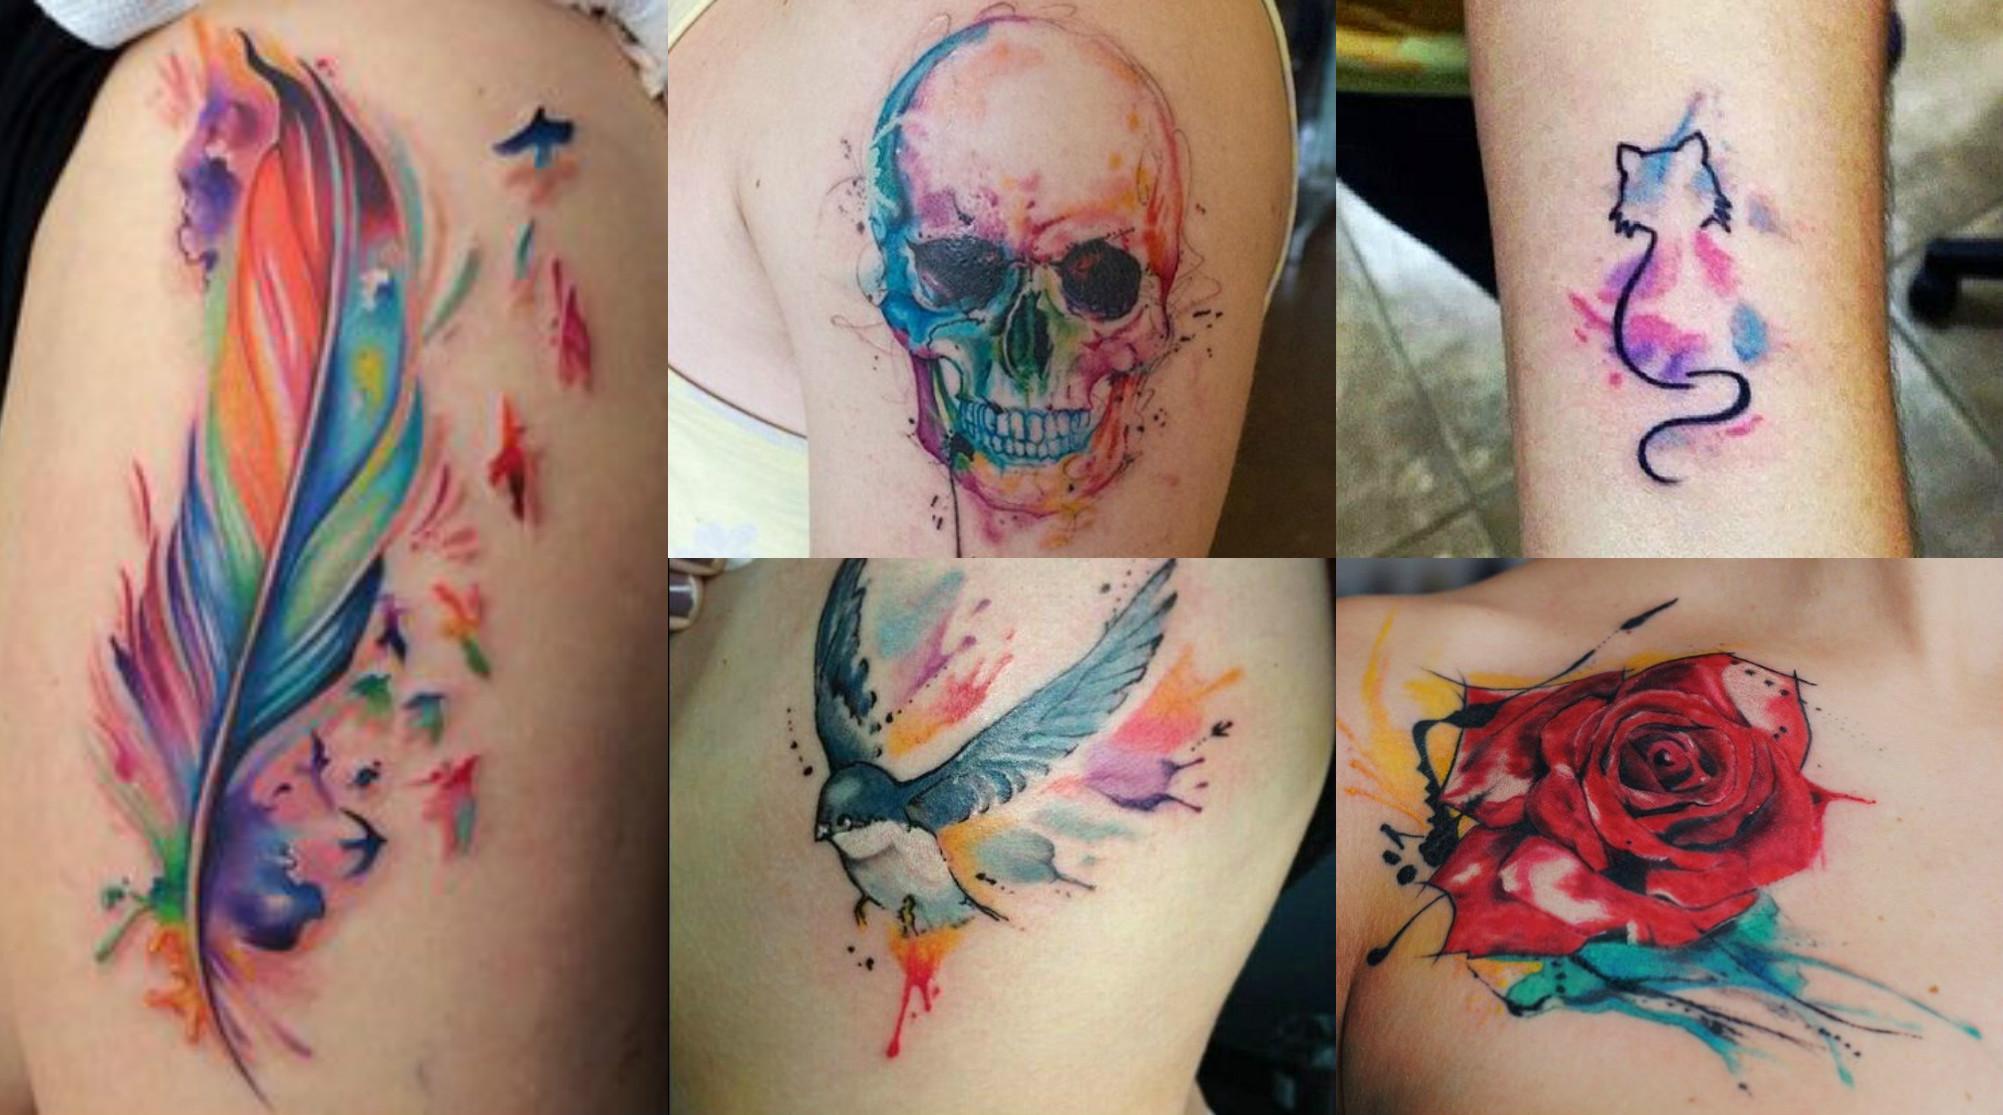 Tatuajes Impares inspiración: watercolor tattoo – capricho site